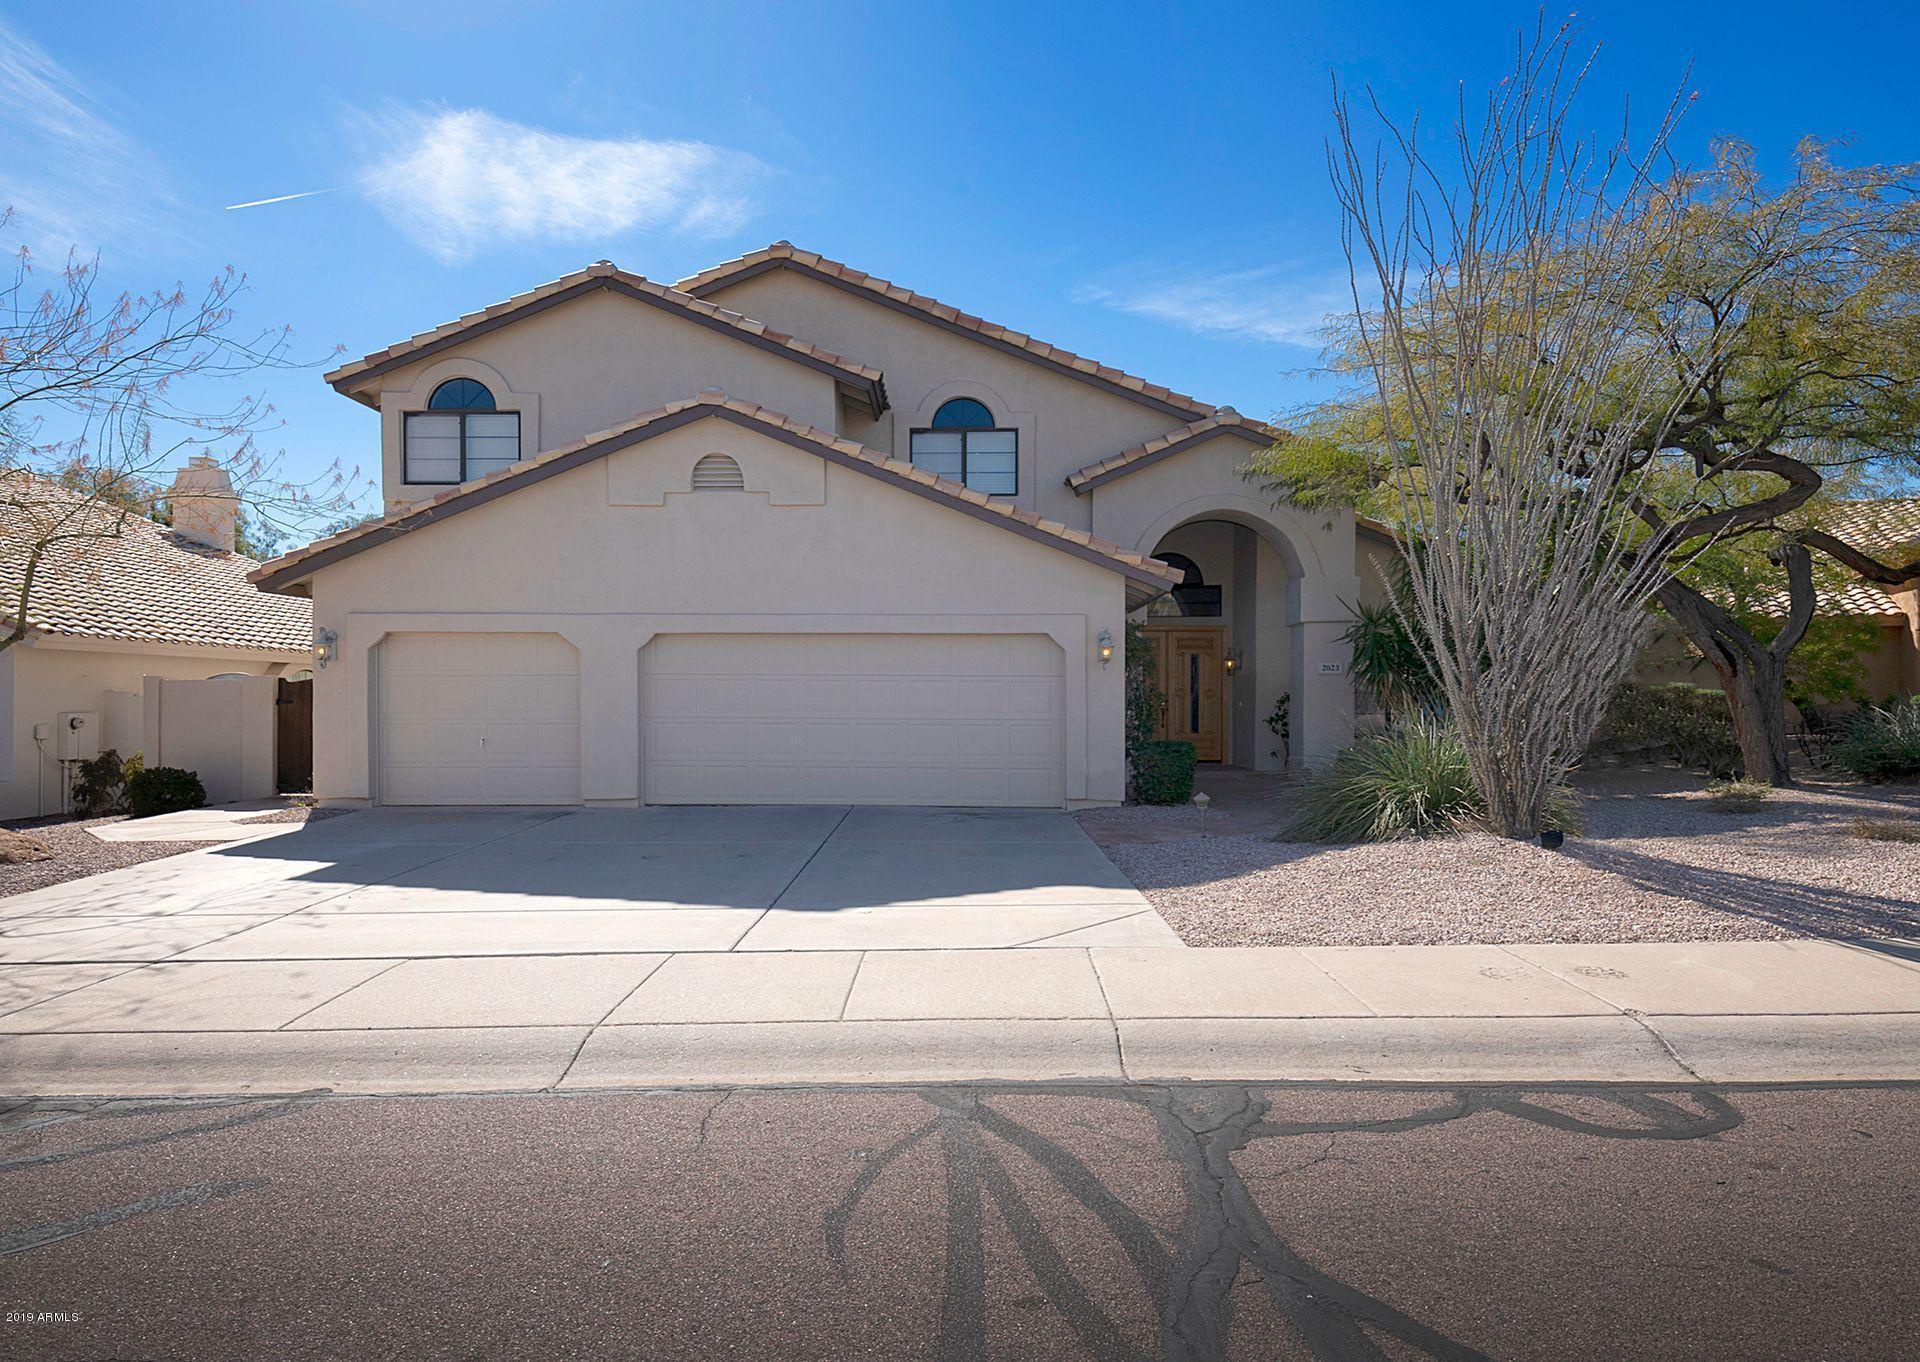 Photo of 2023 E Cathedral Rock Dr Drive, Phoenix, AZ 85048